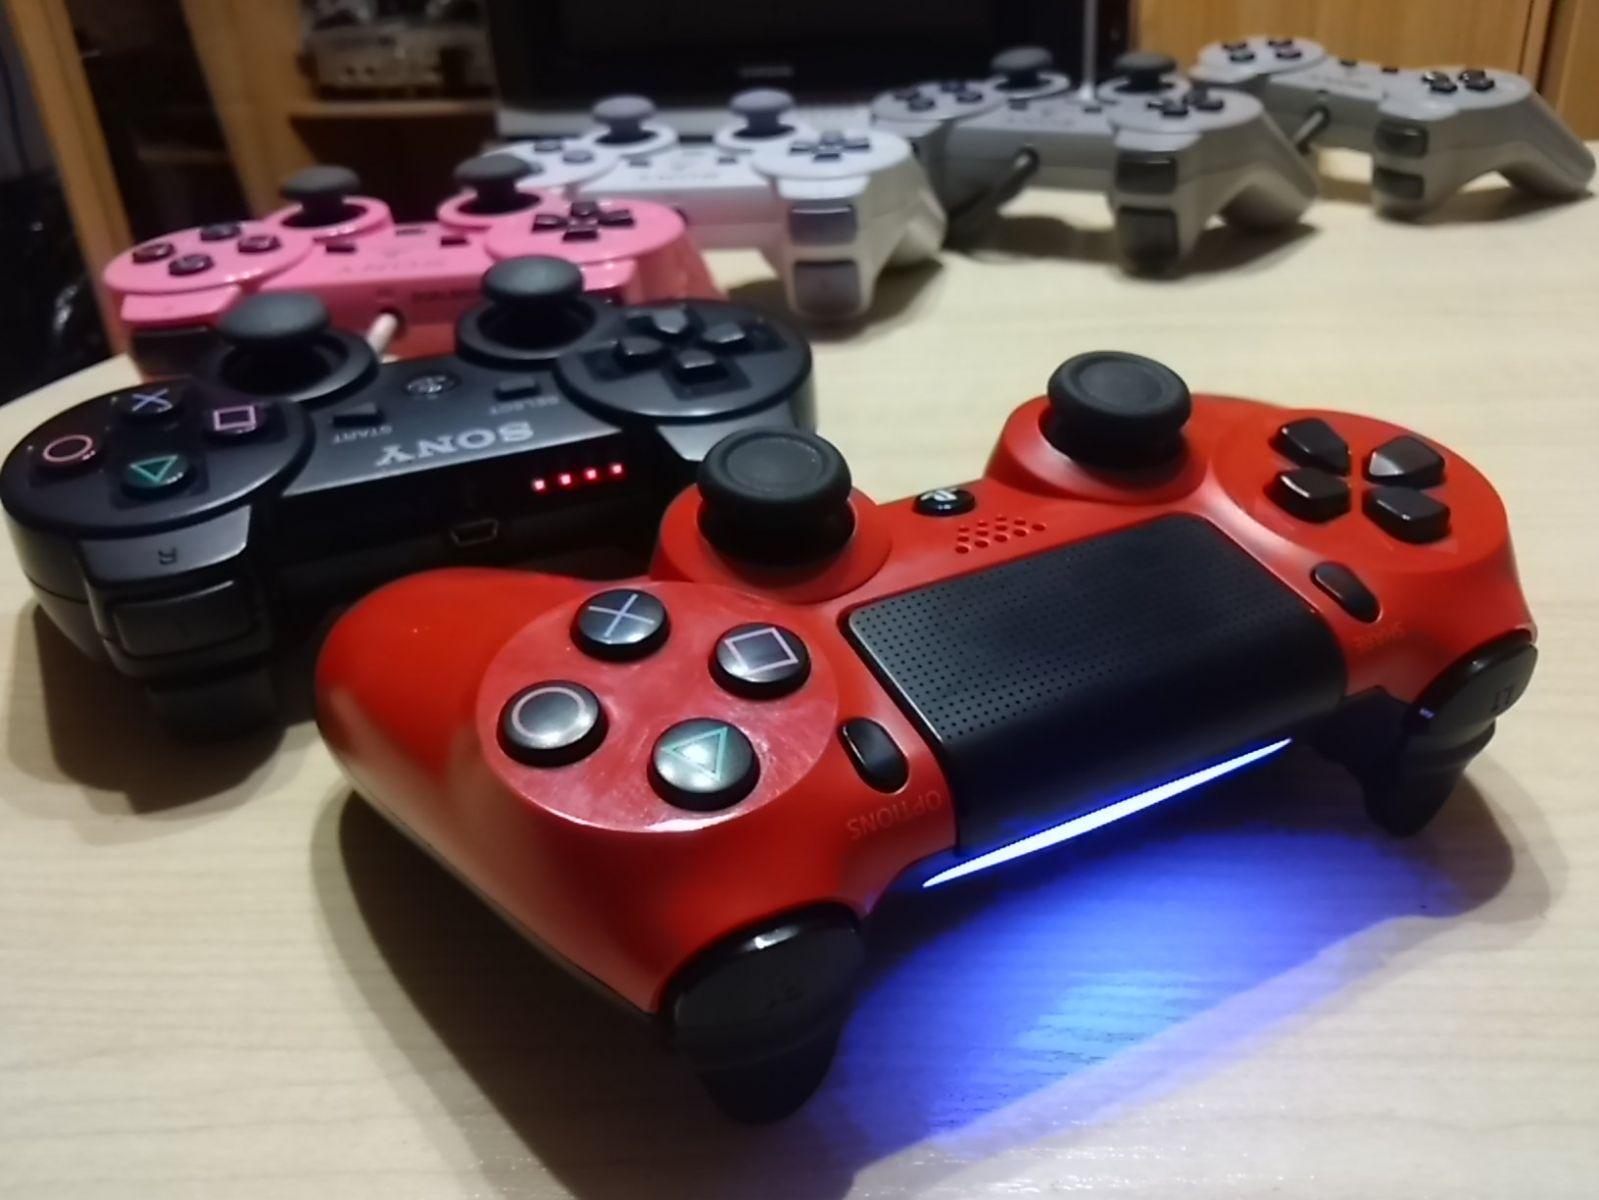 PS4 belaukiant